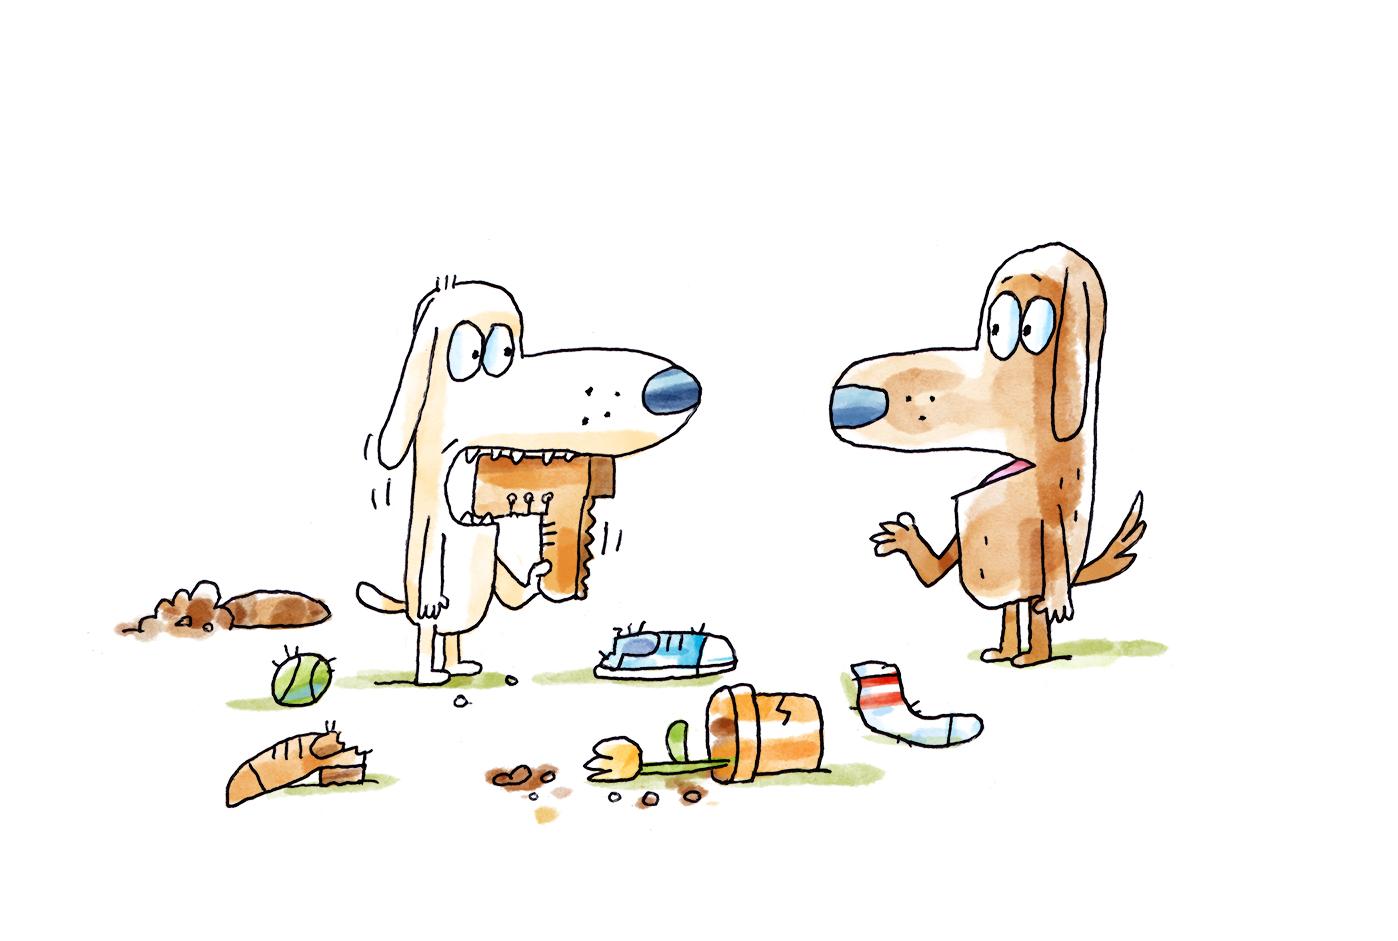 chew_toy_dog_1500.jpg